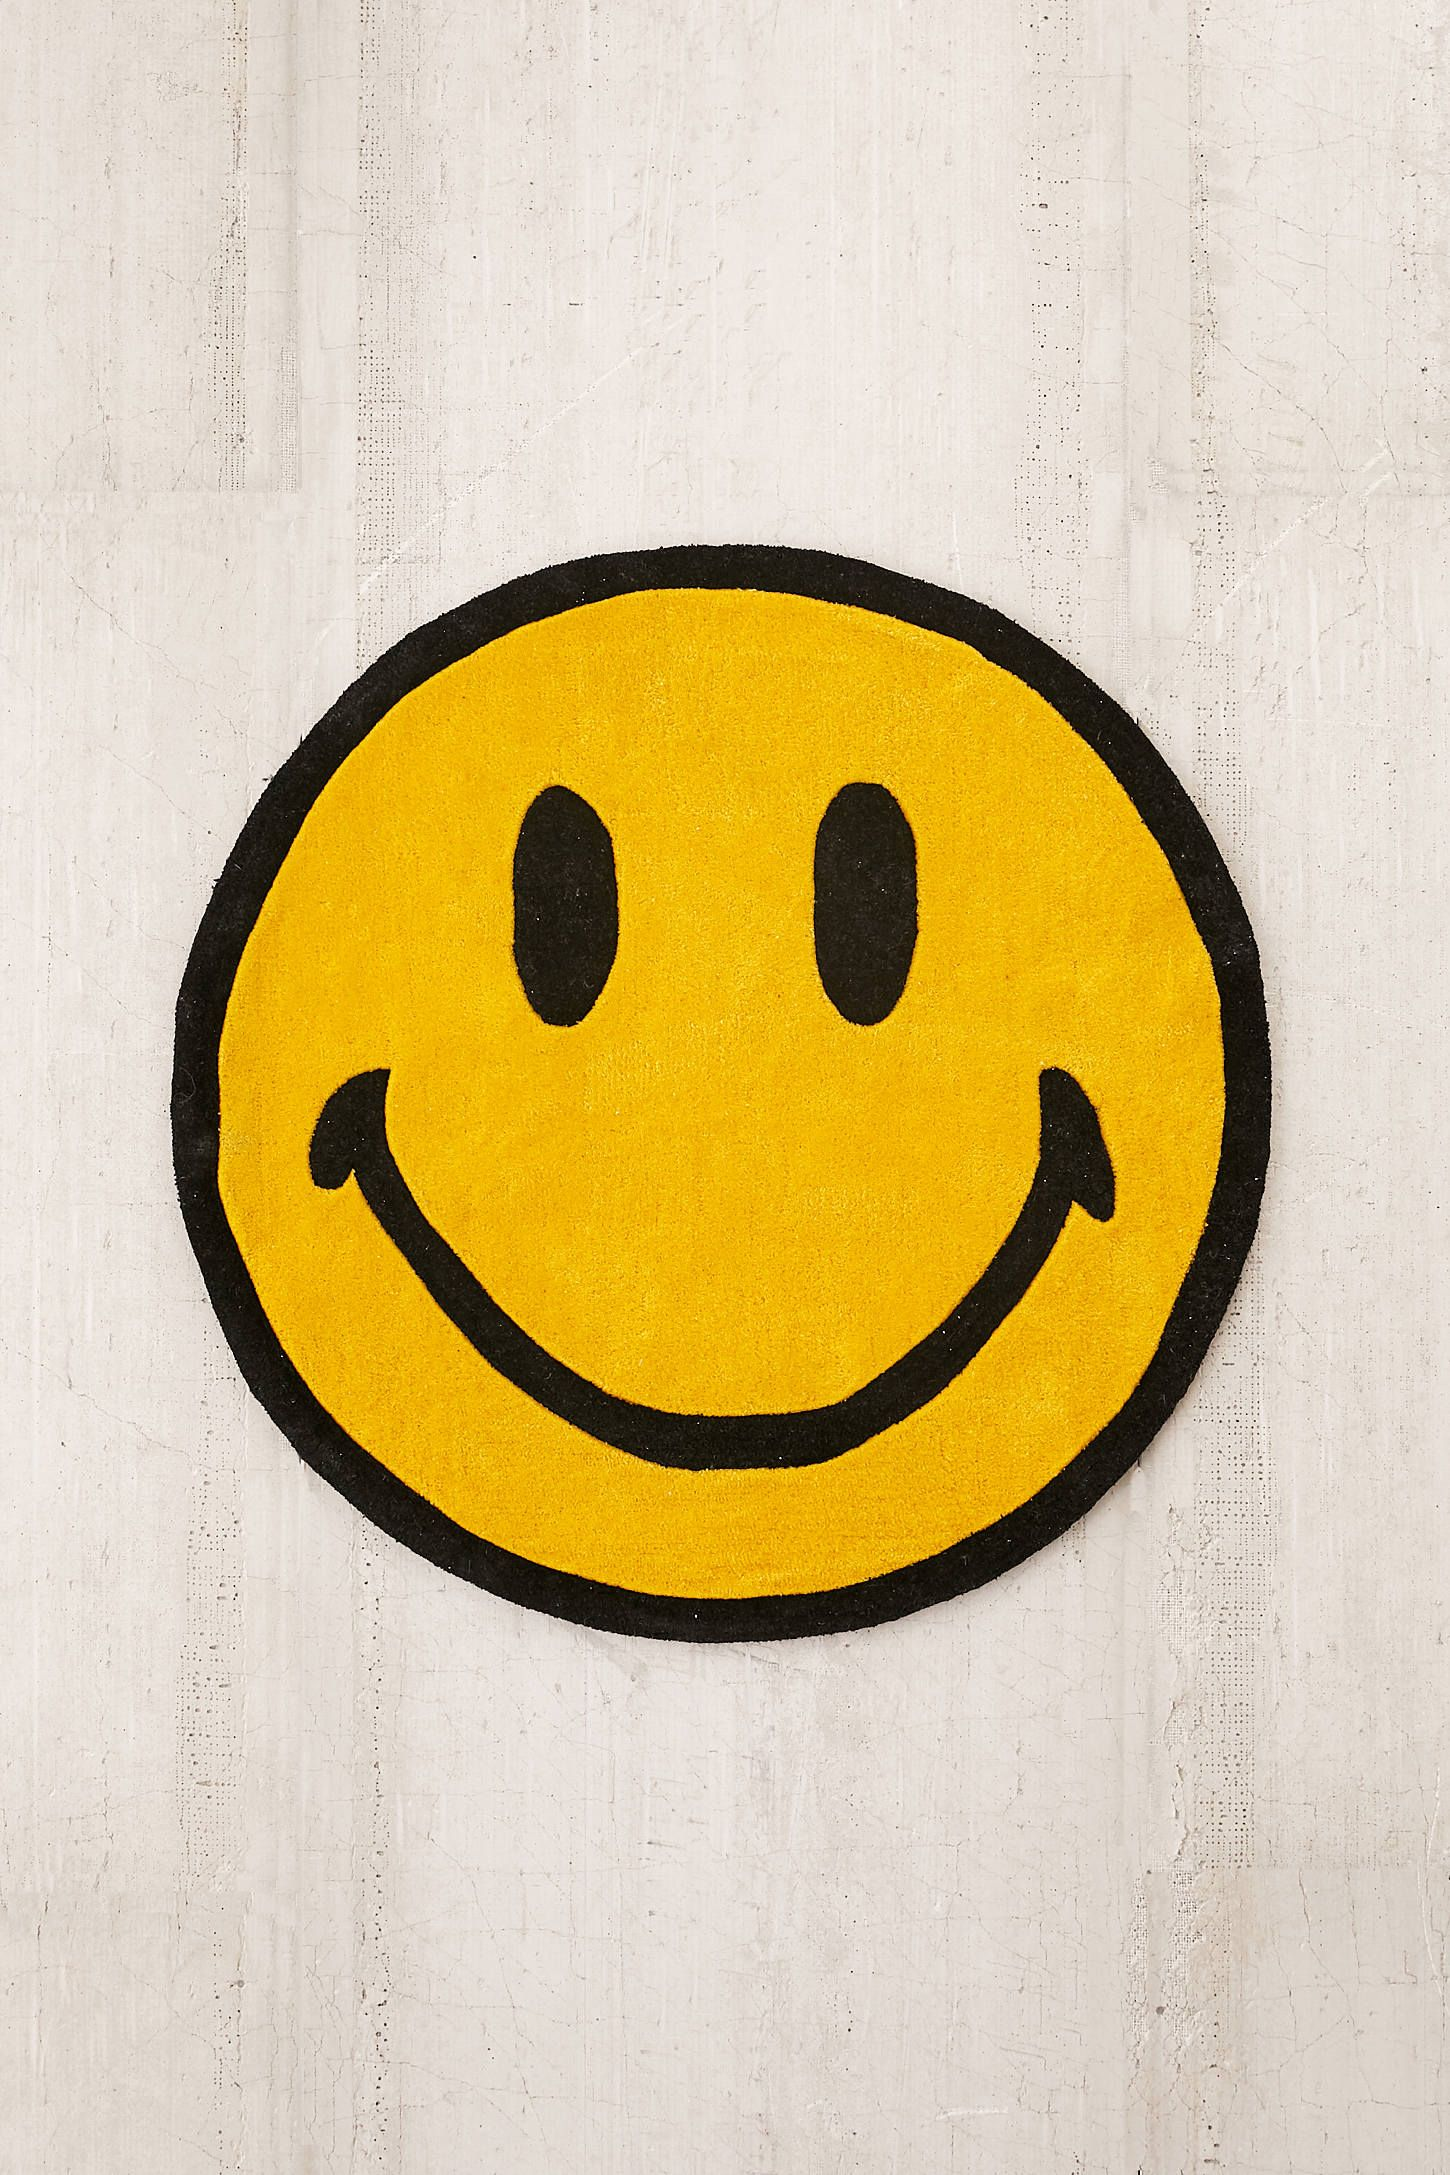 Chinatown Market X Smiley Uo Exclusive Smiley Plush Rug In 2020 Plush Rug Vinyl Art Paint Vinyl Art